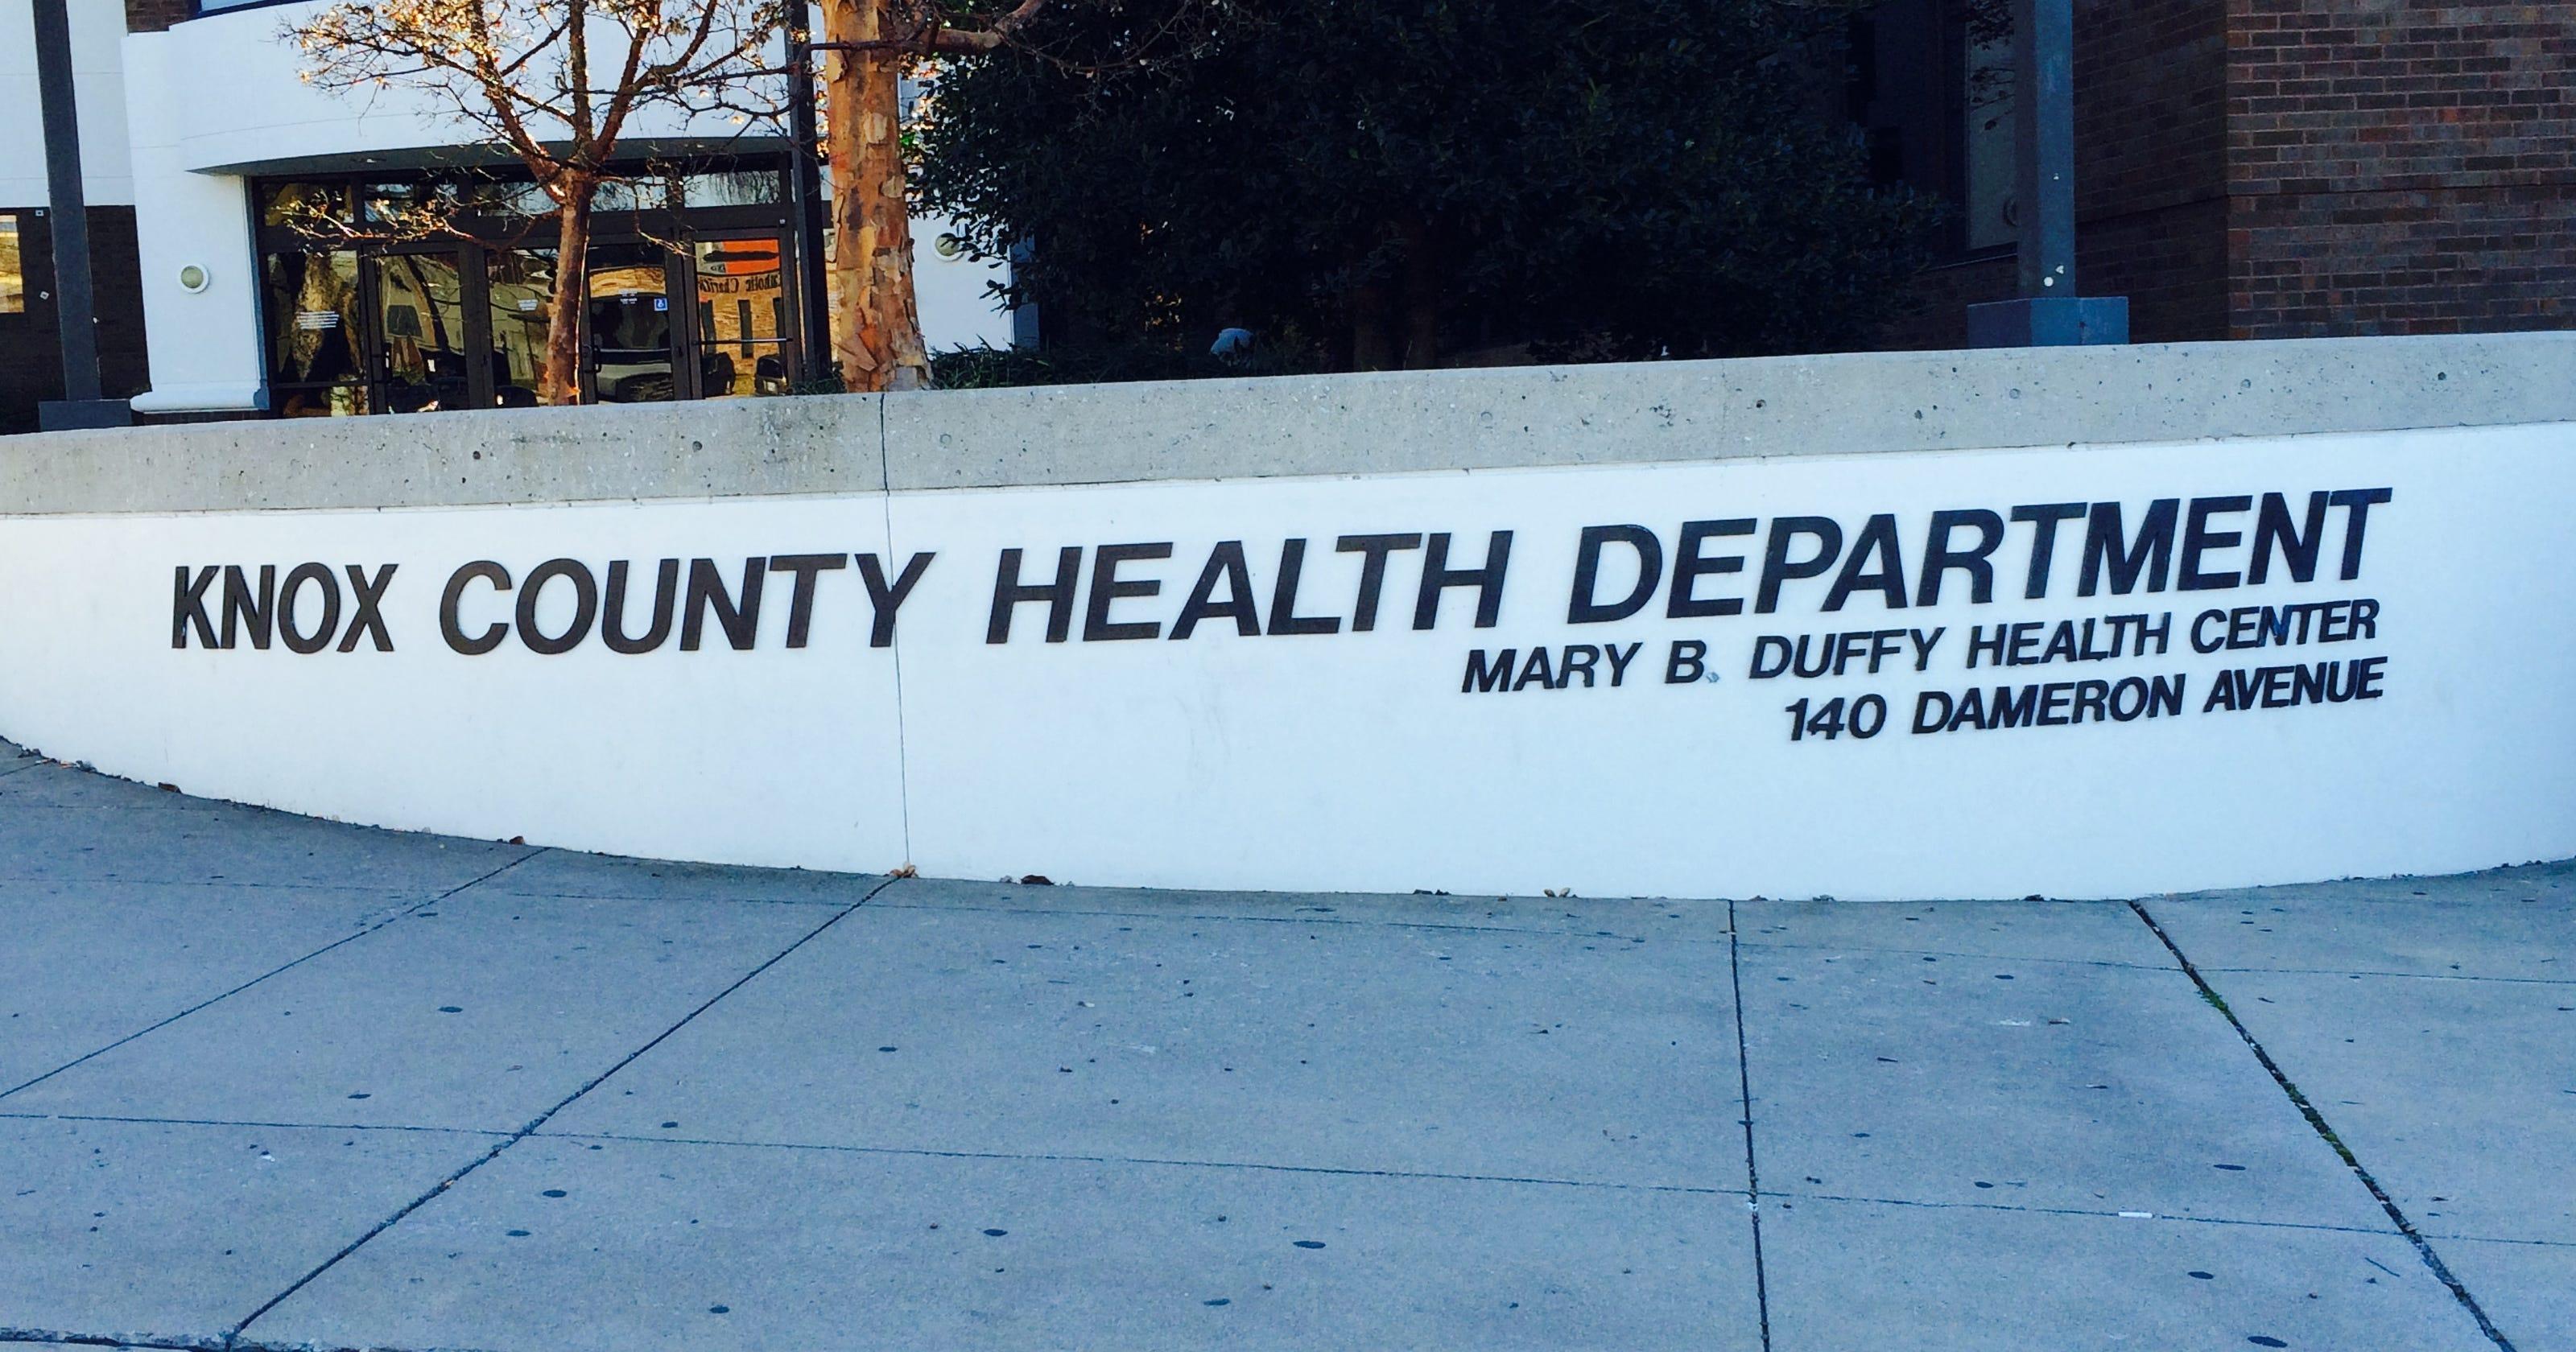 Knox County Health Department restaurant health scores